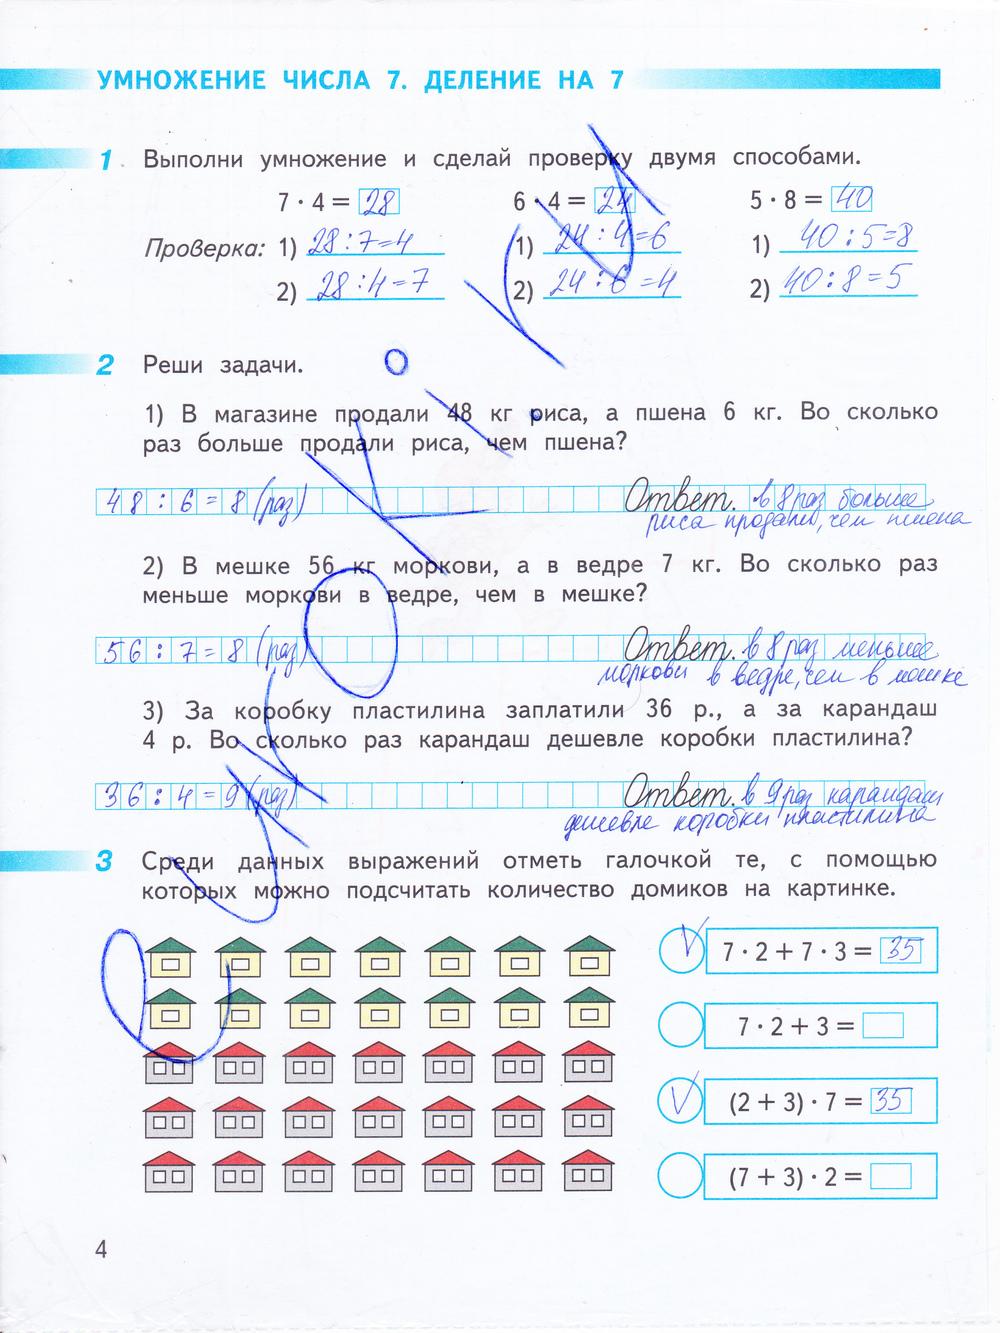 гдз по математике 2класс дрофеев мирокова